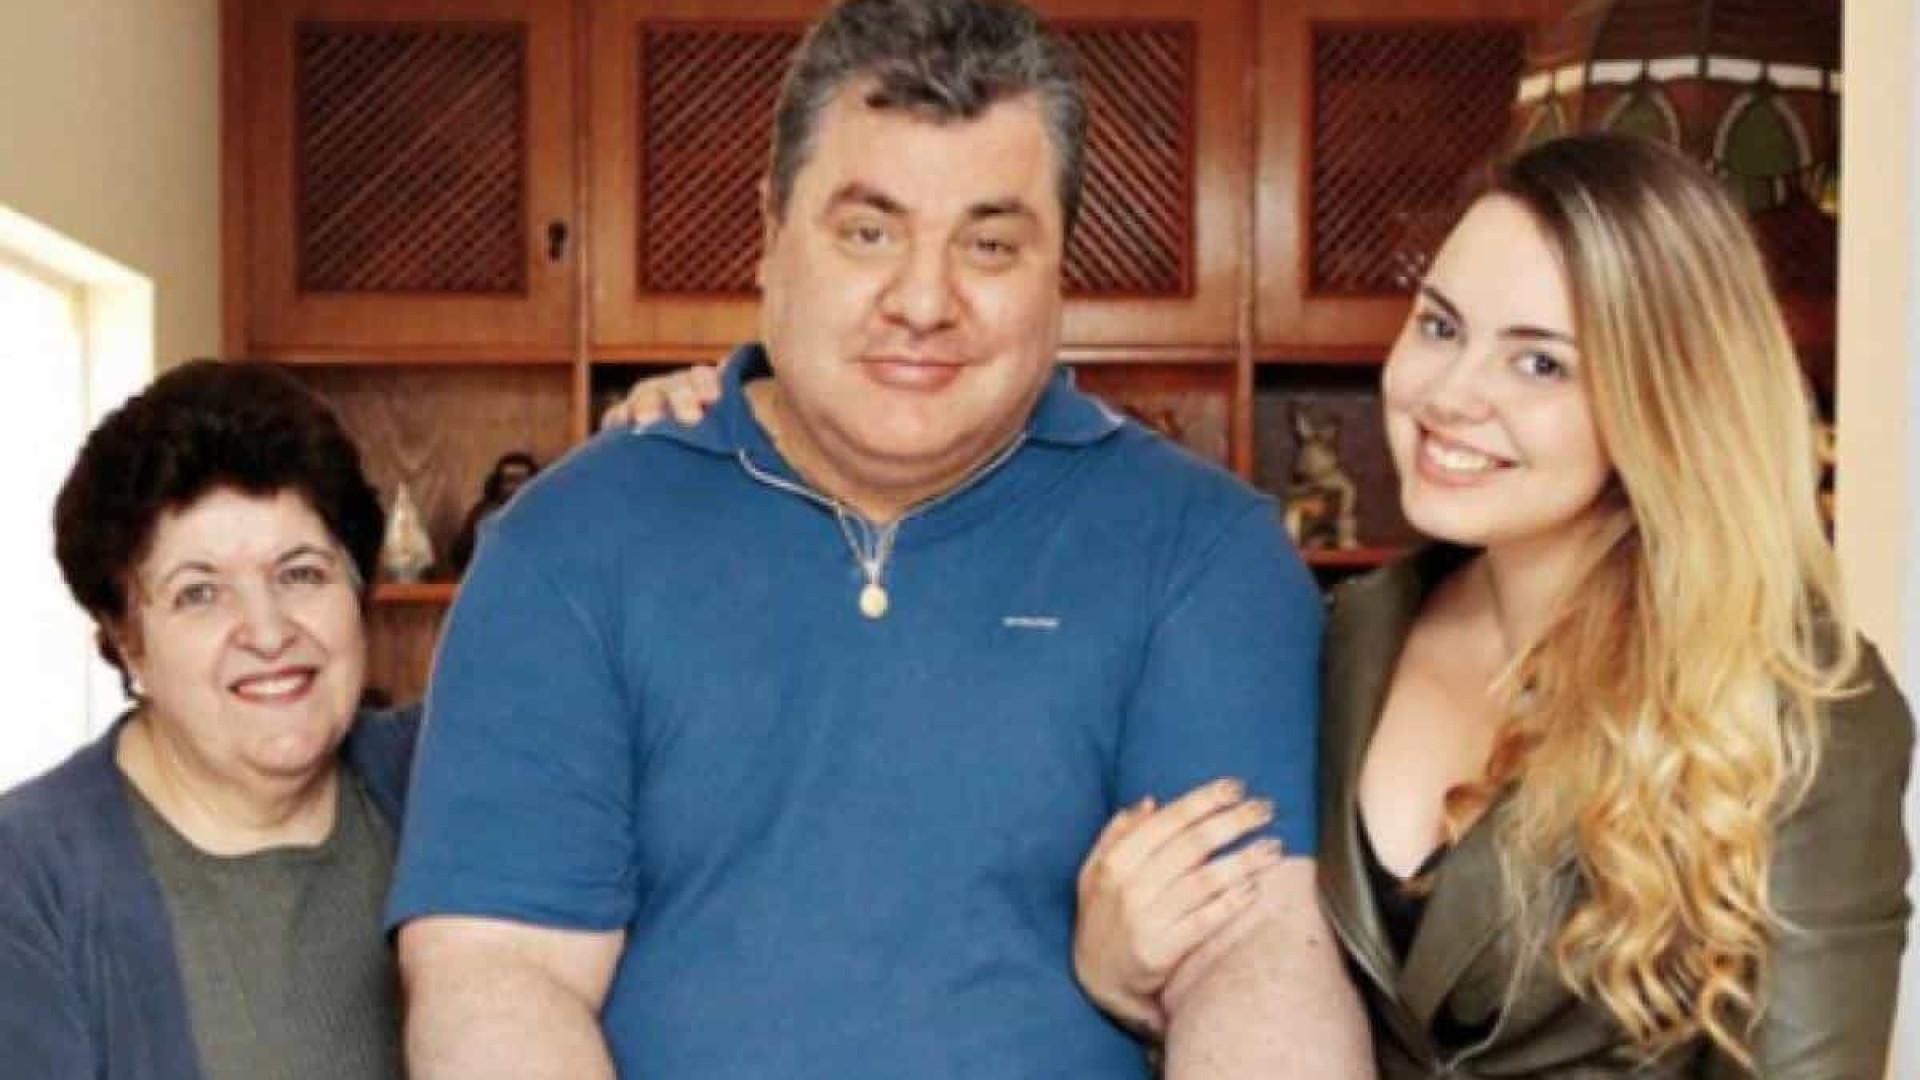 Filha de Gerson Brenner arrecada R$ 120 mil e compra carro adaptado para o pai